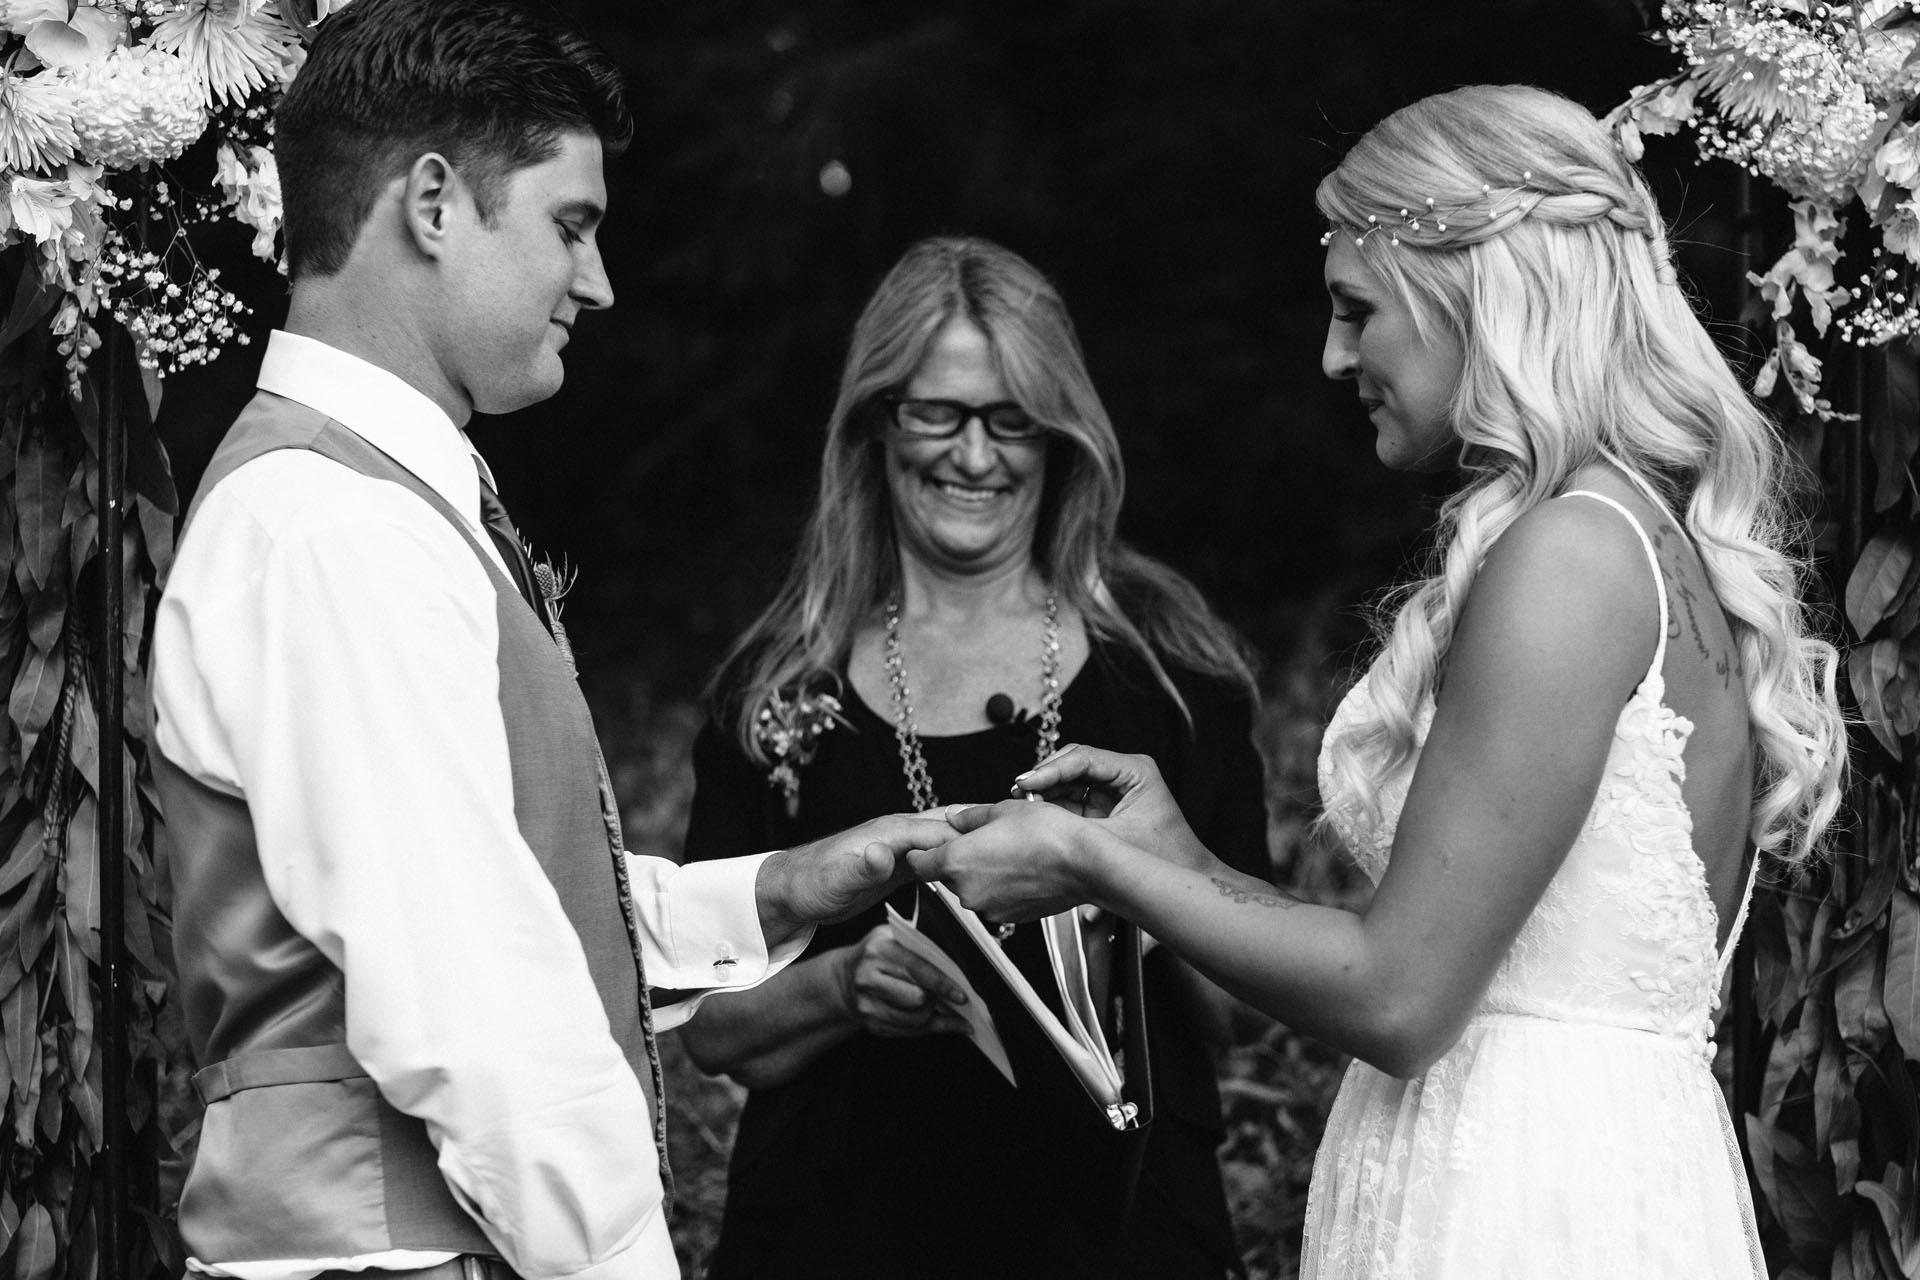 10-7-17 Devon and Jordan's Wedding-110.jpg